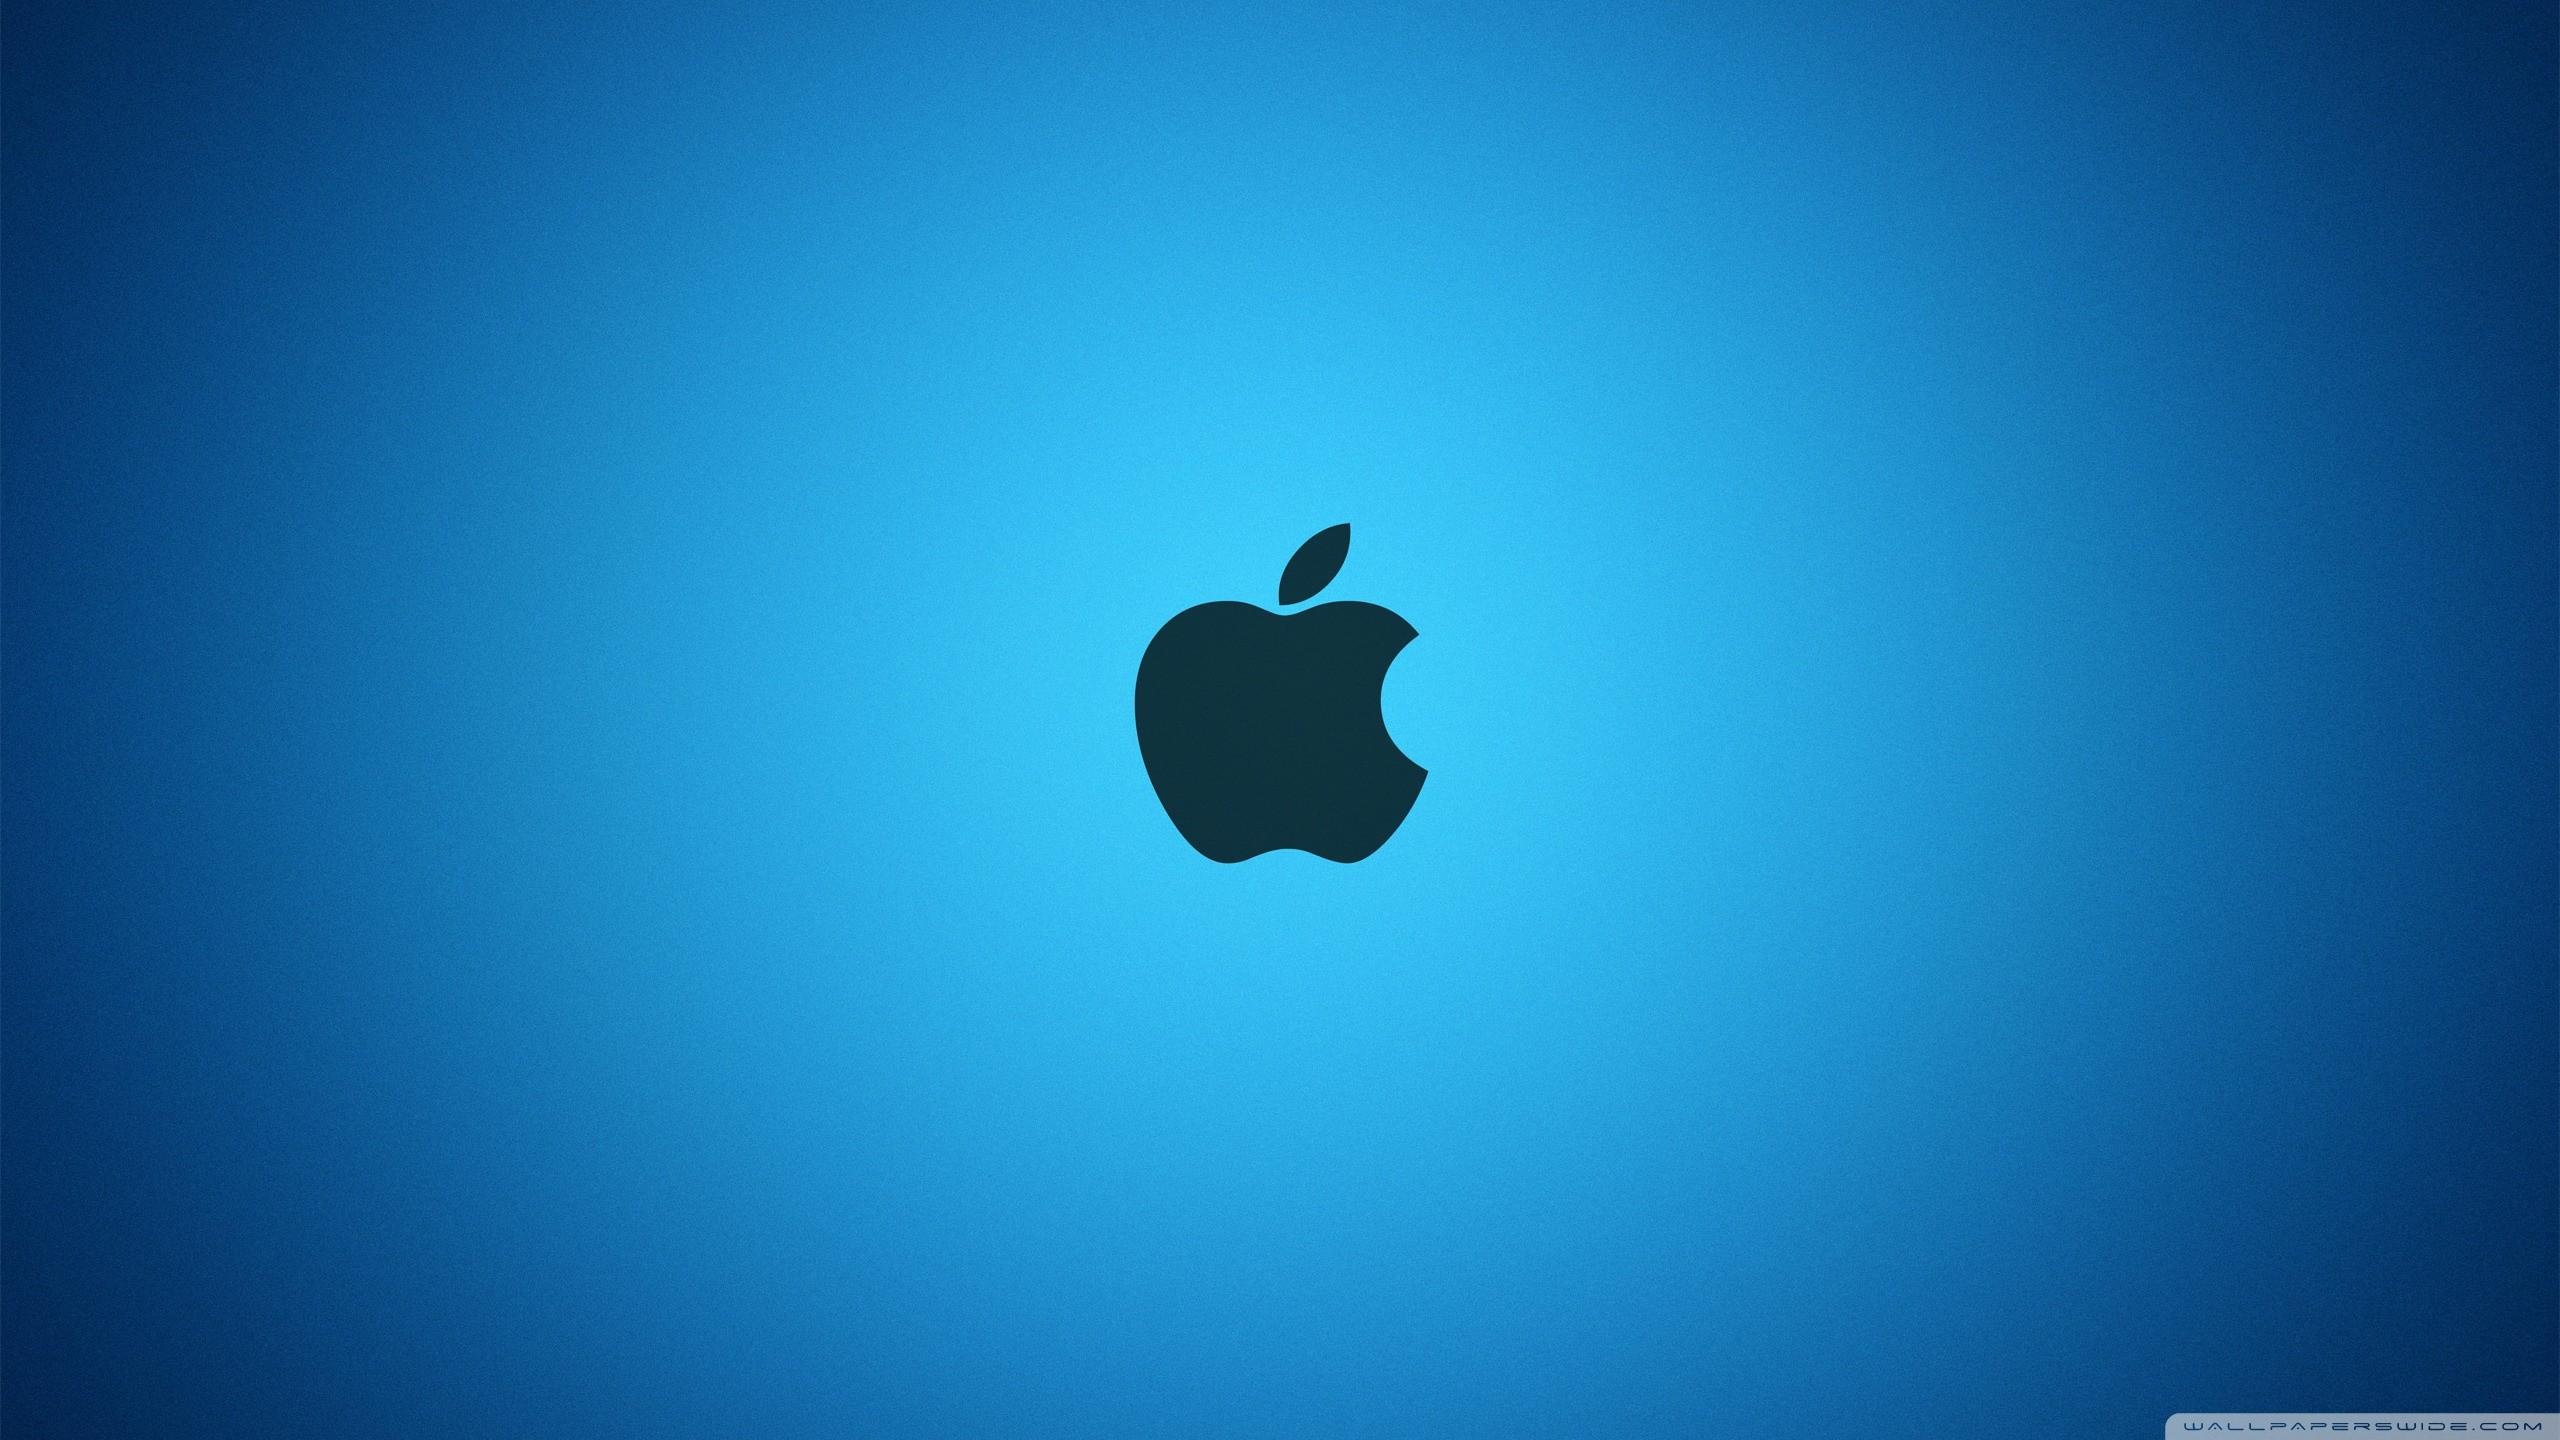 Apple · Apple Logo Wallpaper